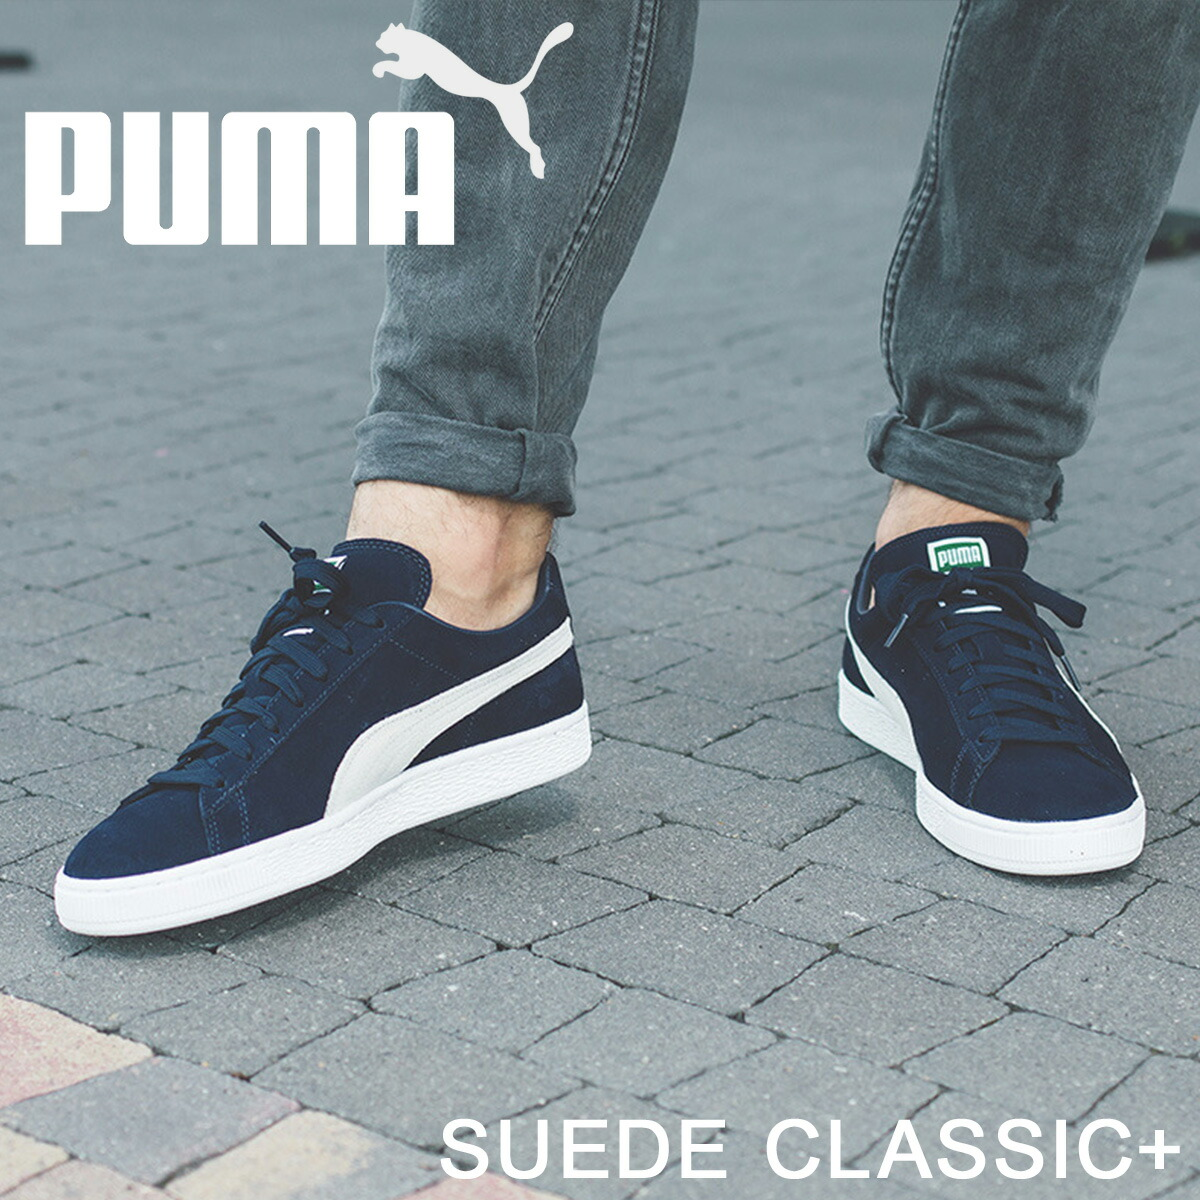 Puma suede classical music sneakers